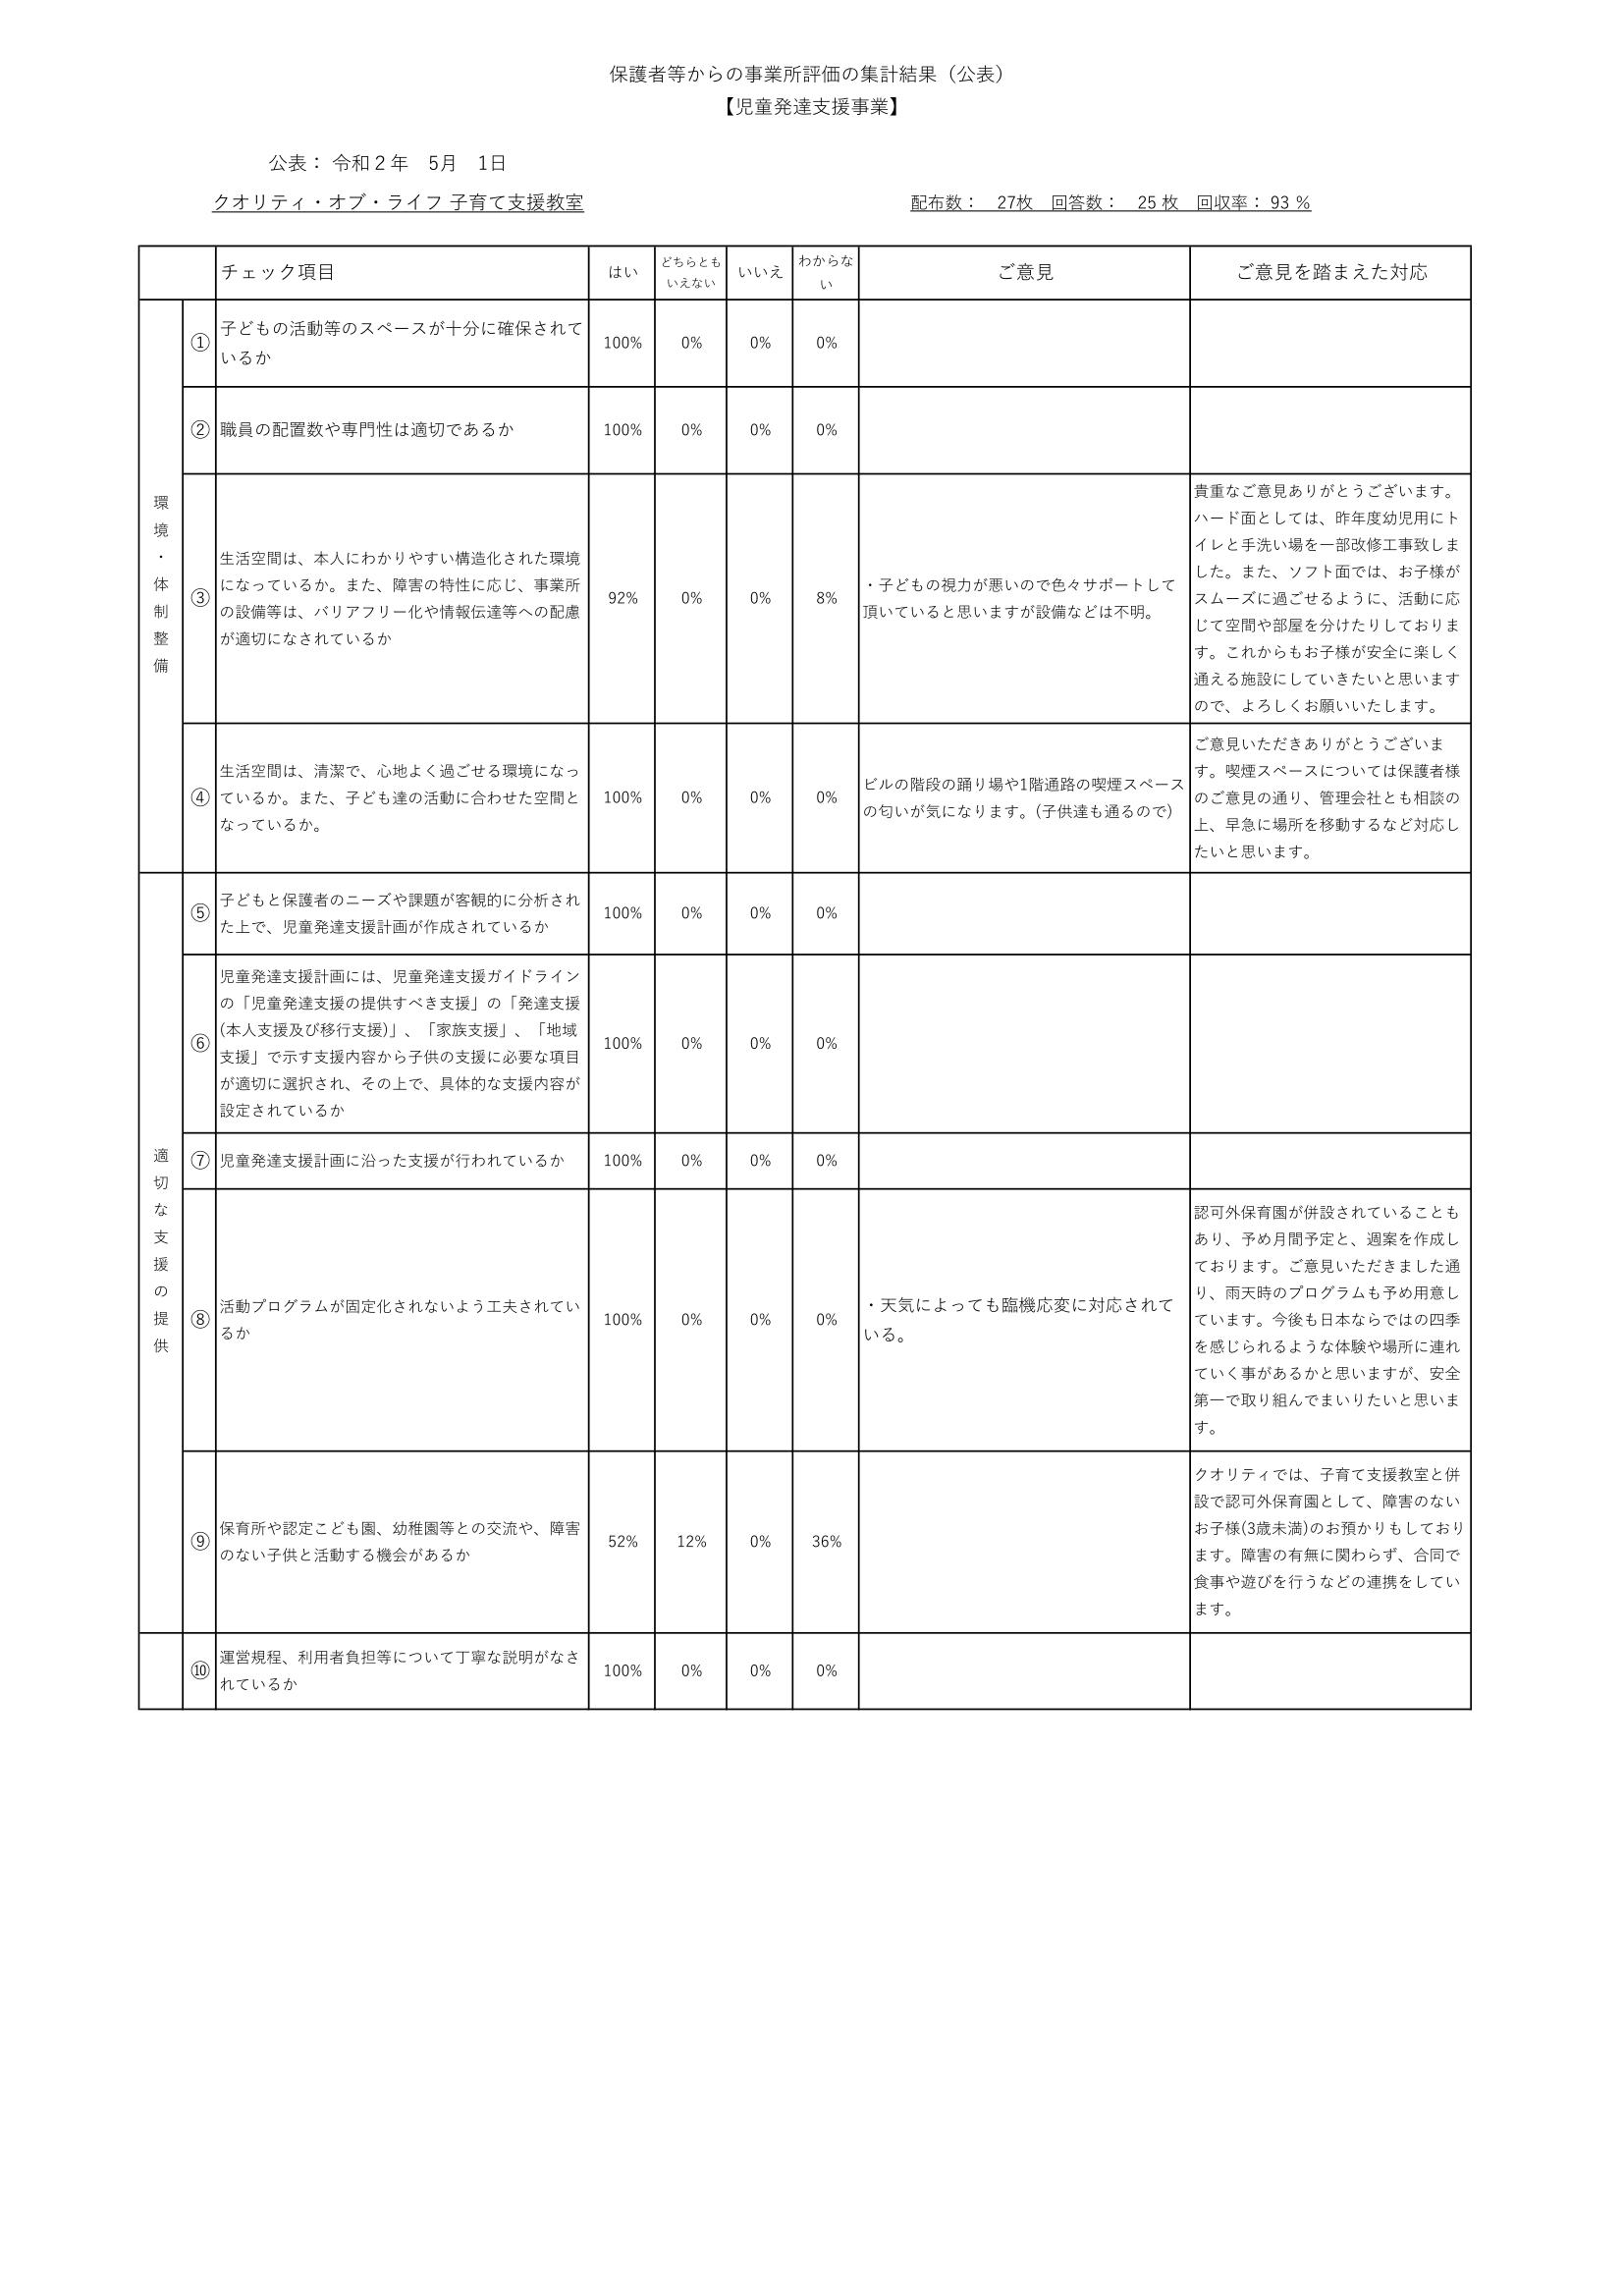 保護者向け自己評価表【児童デイ】(令和元年度)